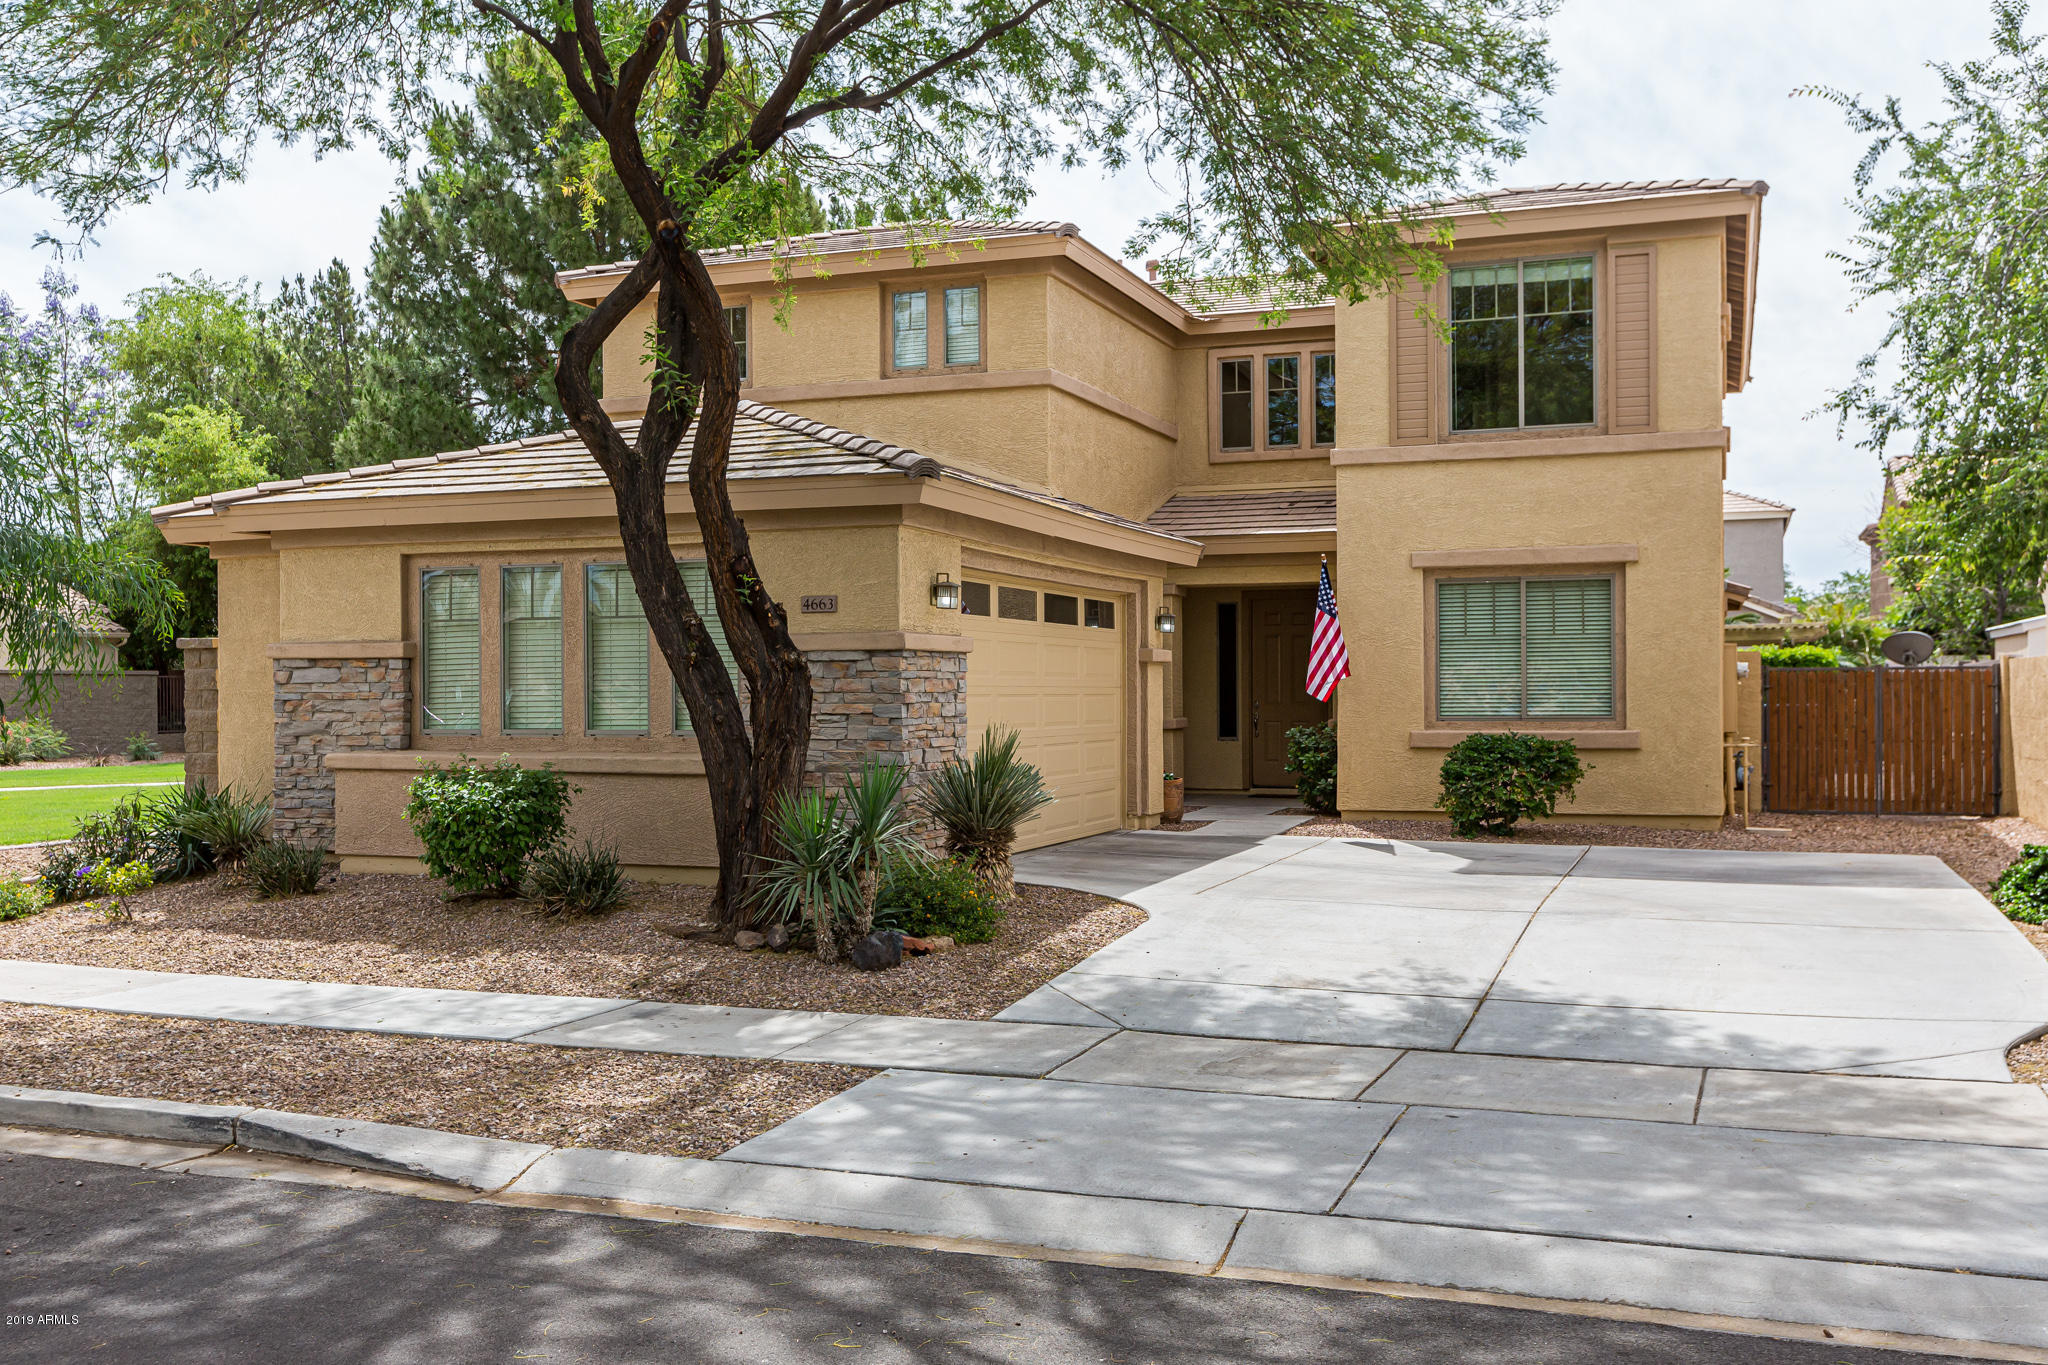 MLS 5927544 4663 E CABRILLO Drive, Gilbert, AZ 85297 Gilbert AZ Power Ranch